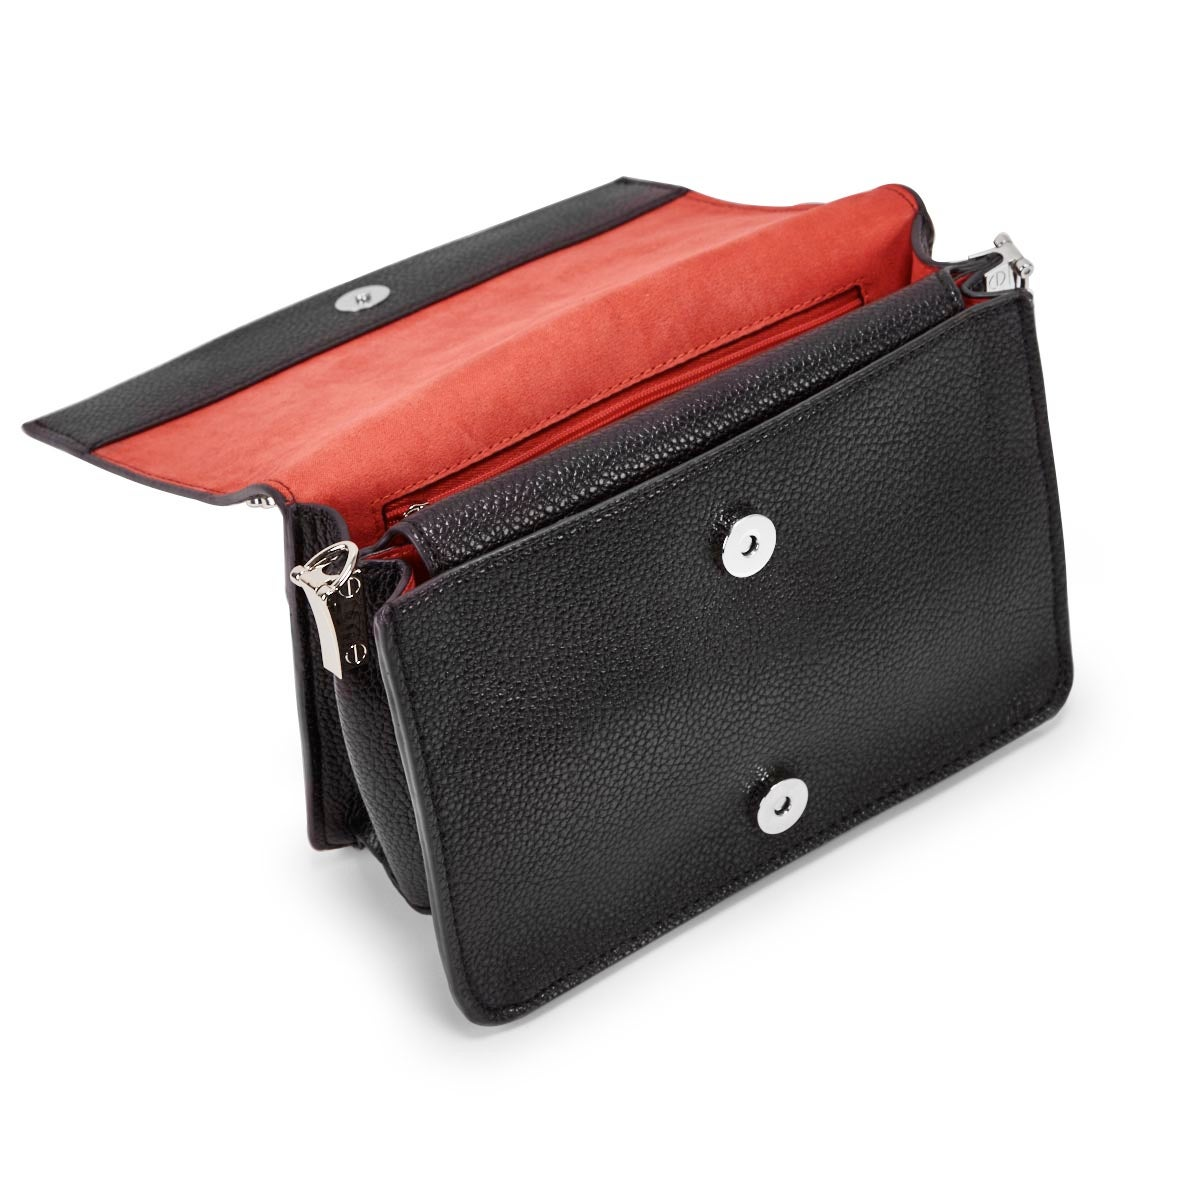 Lds BPosh blk crossbody bag